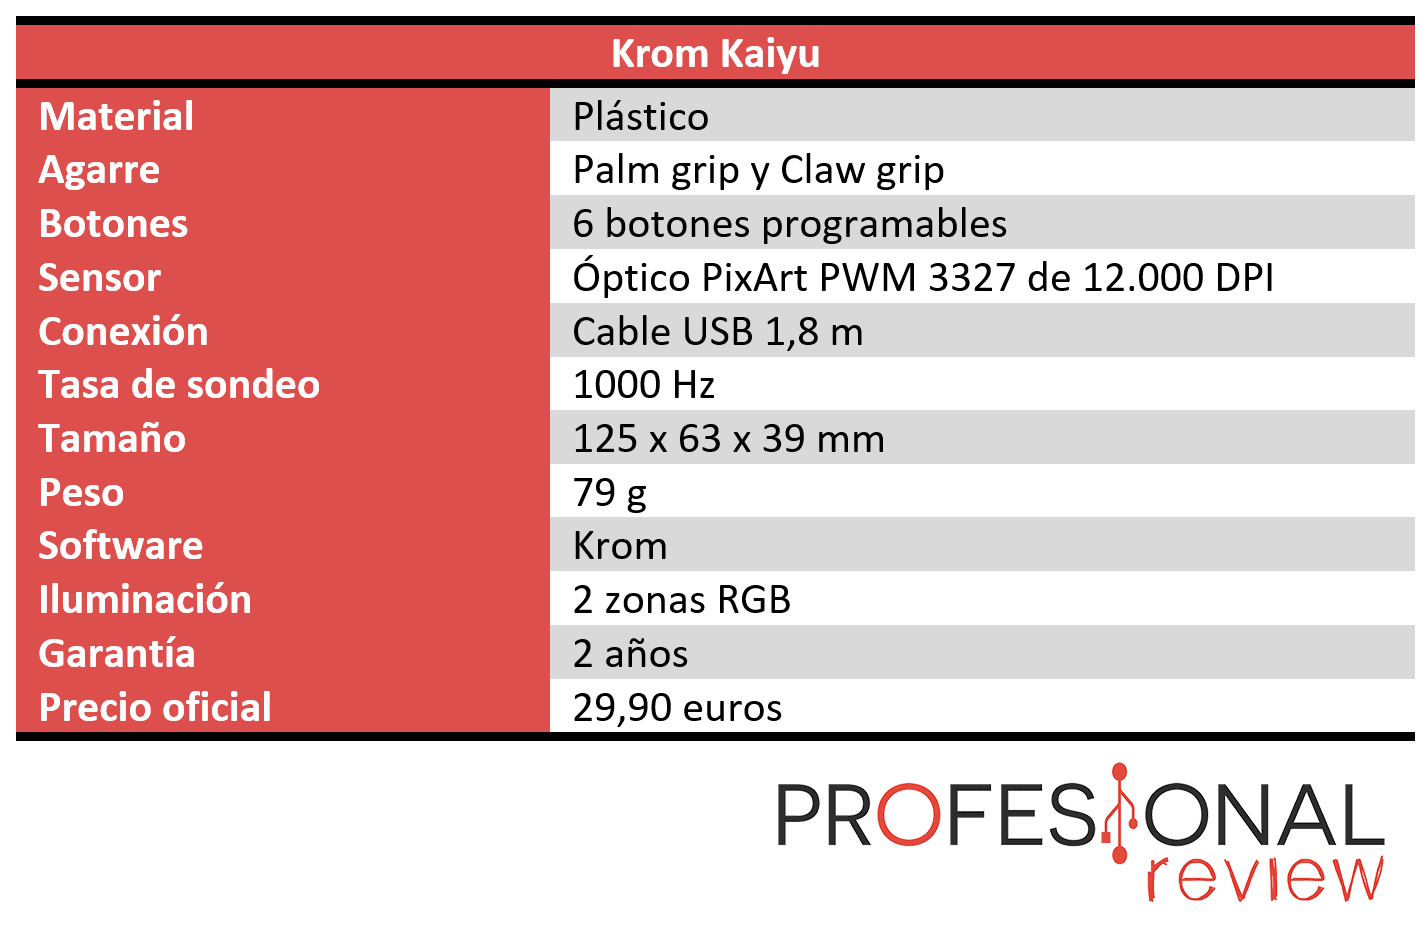 Krom Kaiyu Características